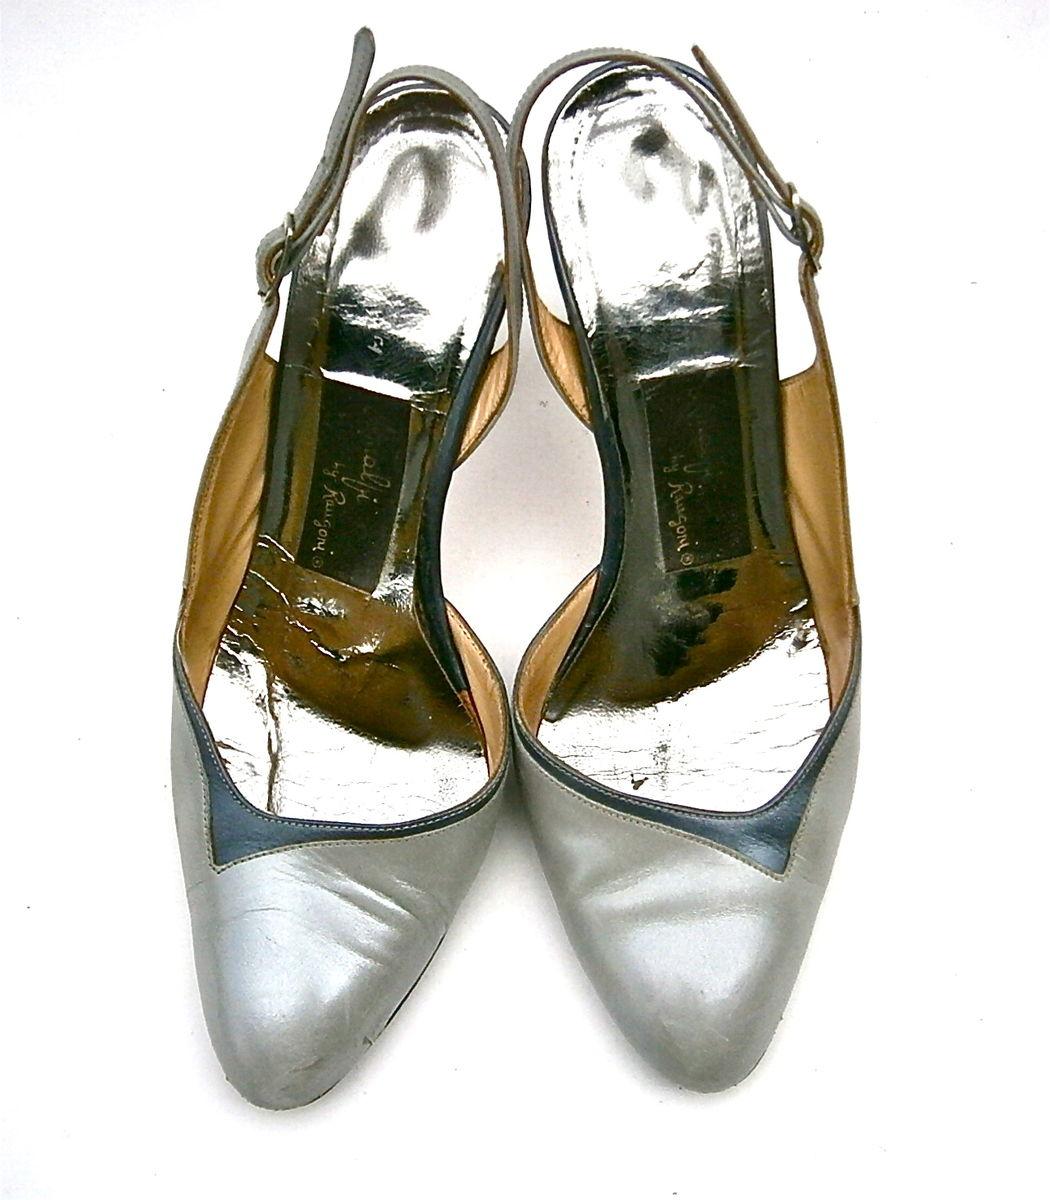 9455253aecdab Vintage Gray Ladies Shoes High Heels Pumps Slingback Women Size 5 ...